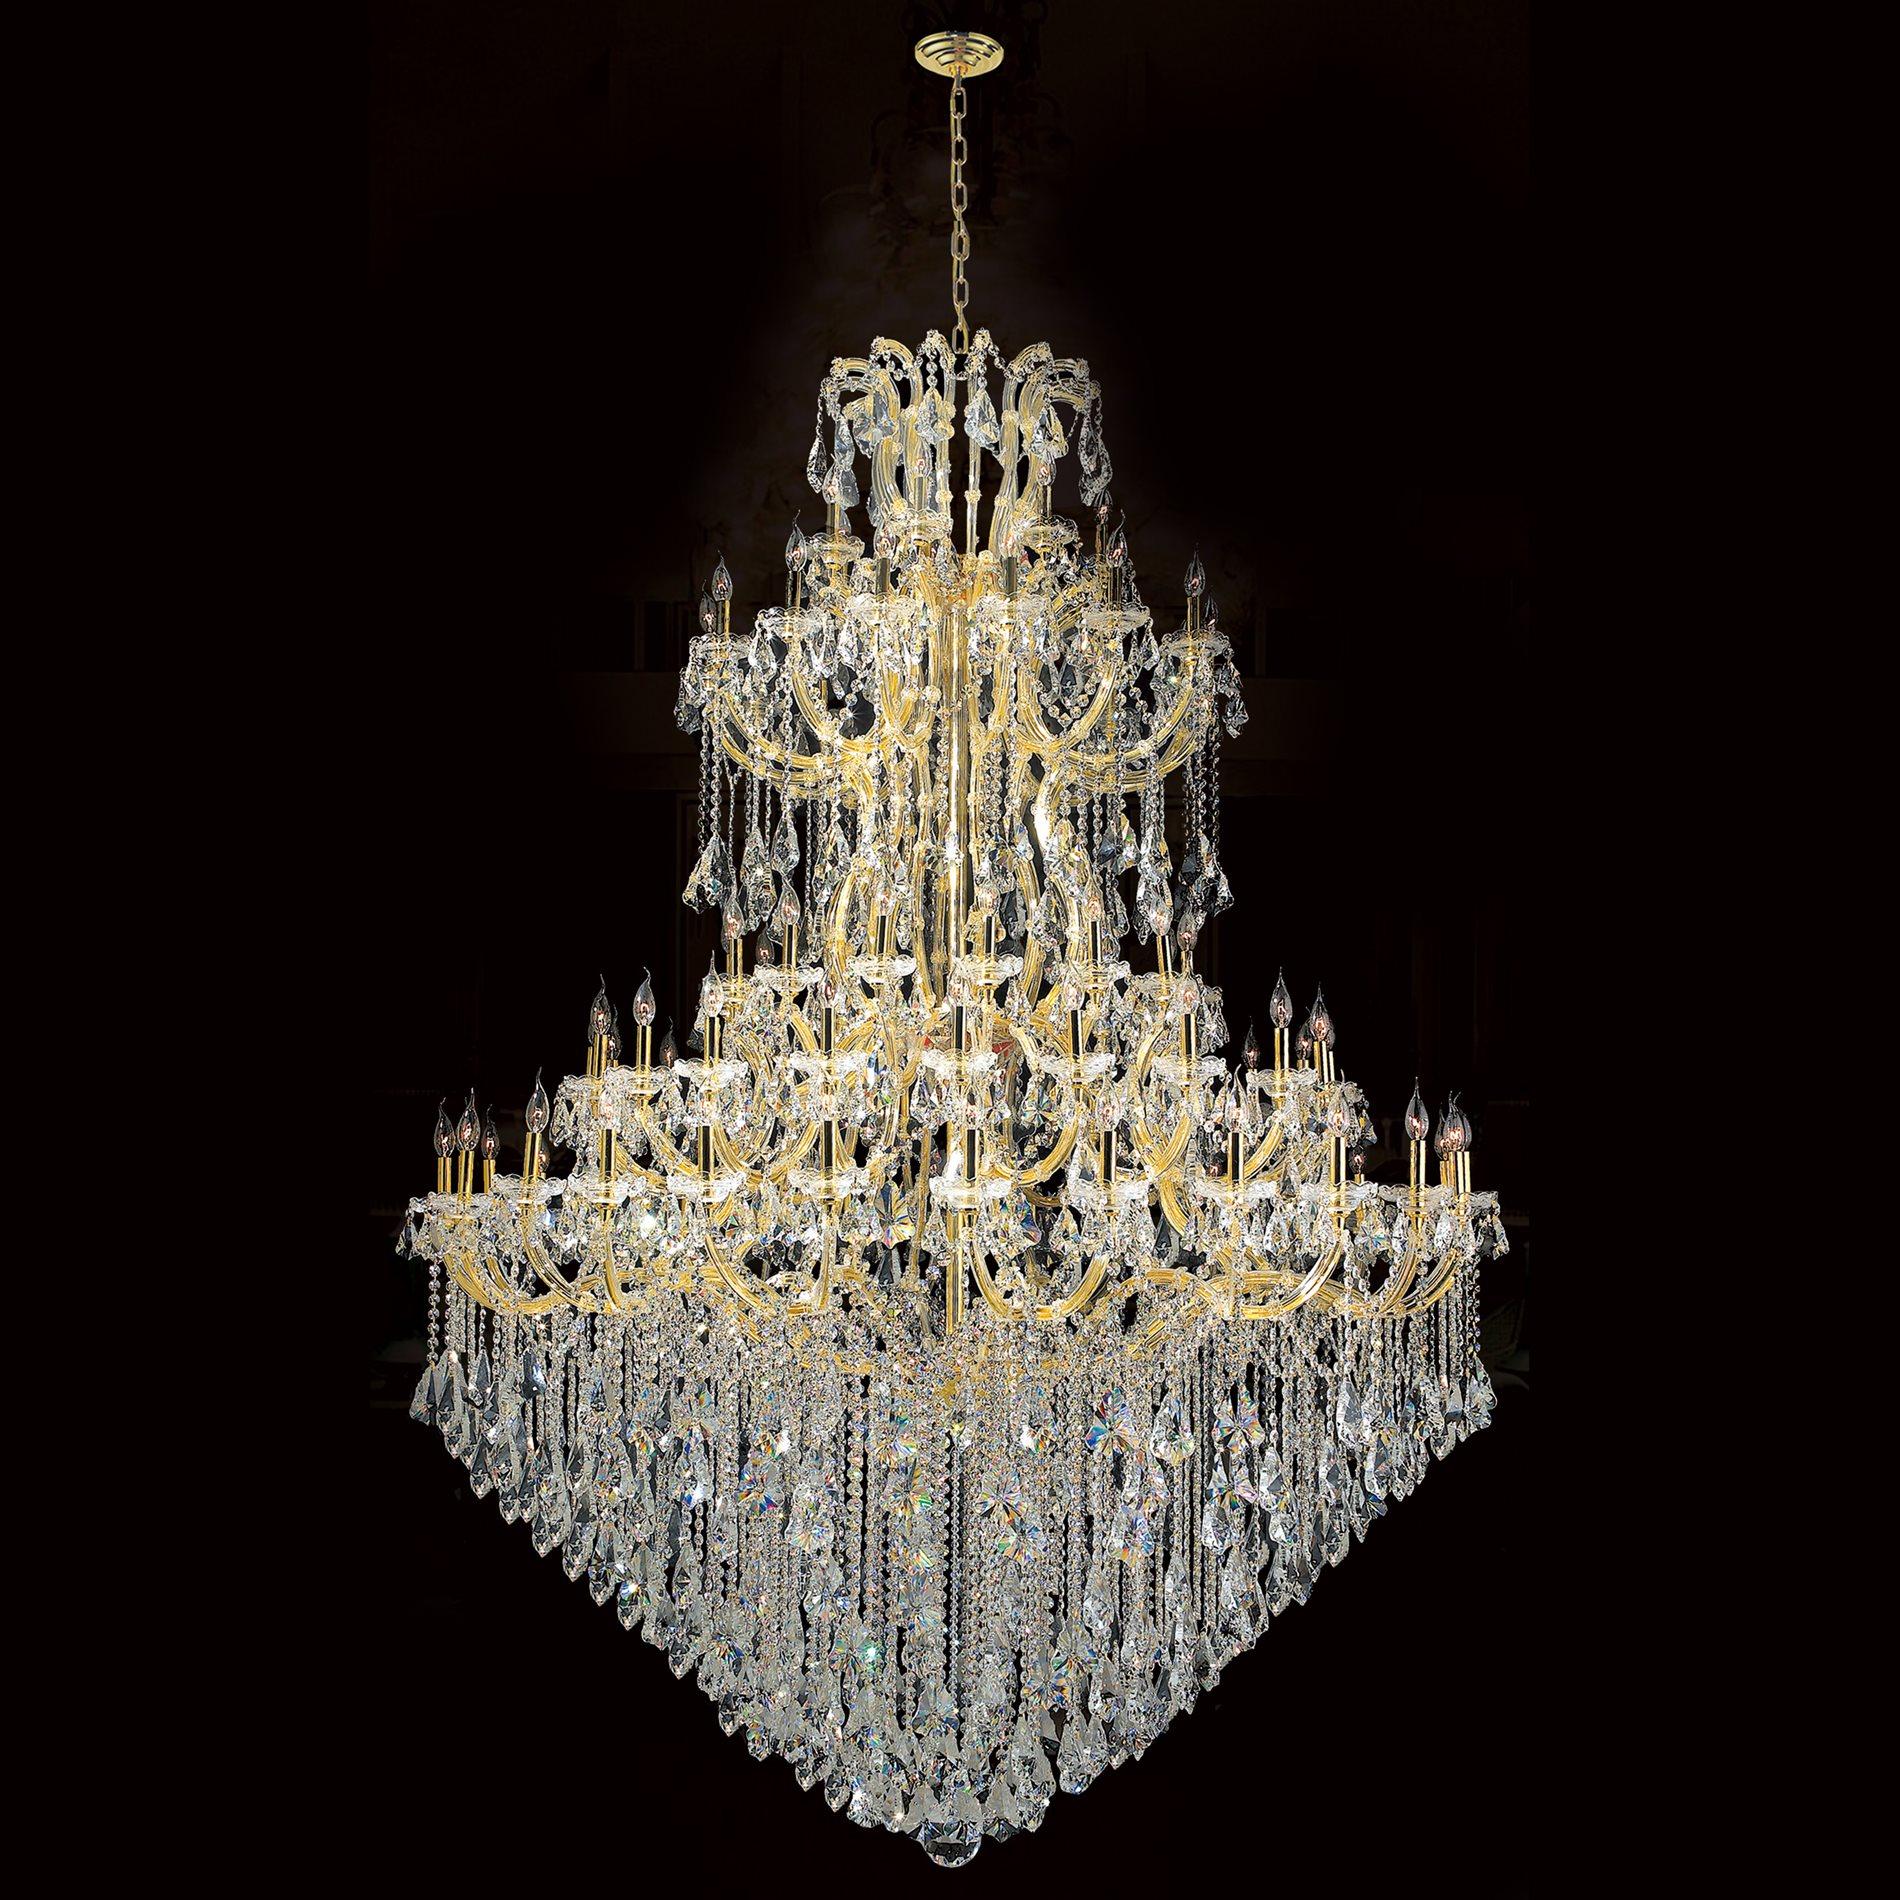 Worldwide Lighting W83069g72 Maria Theresa Traditional